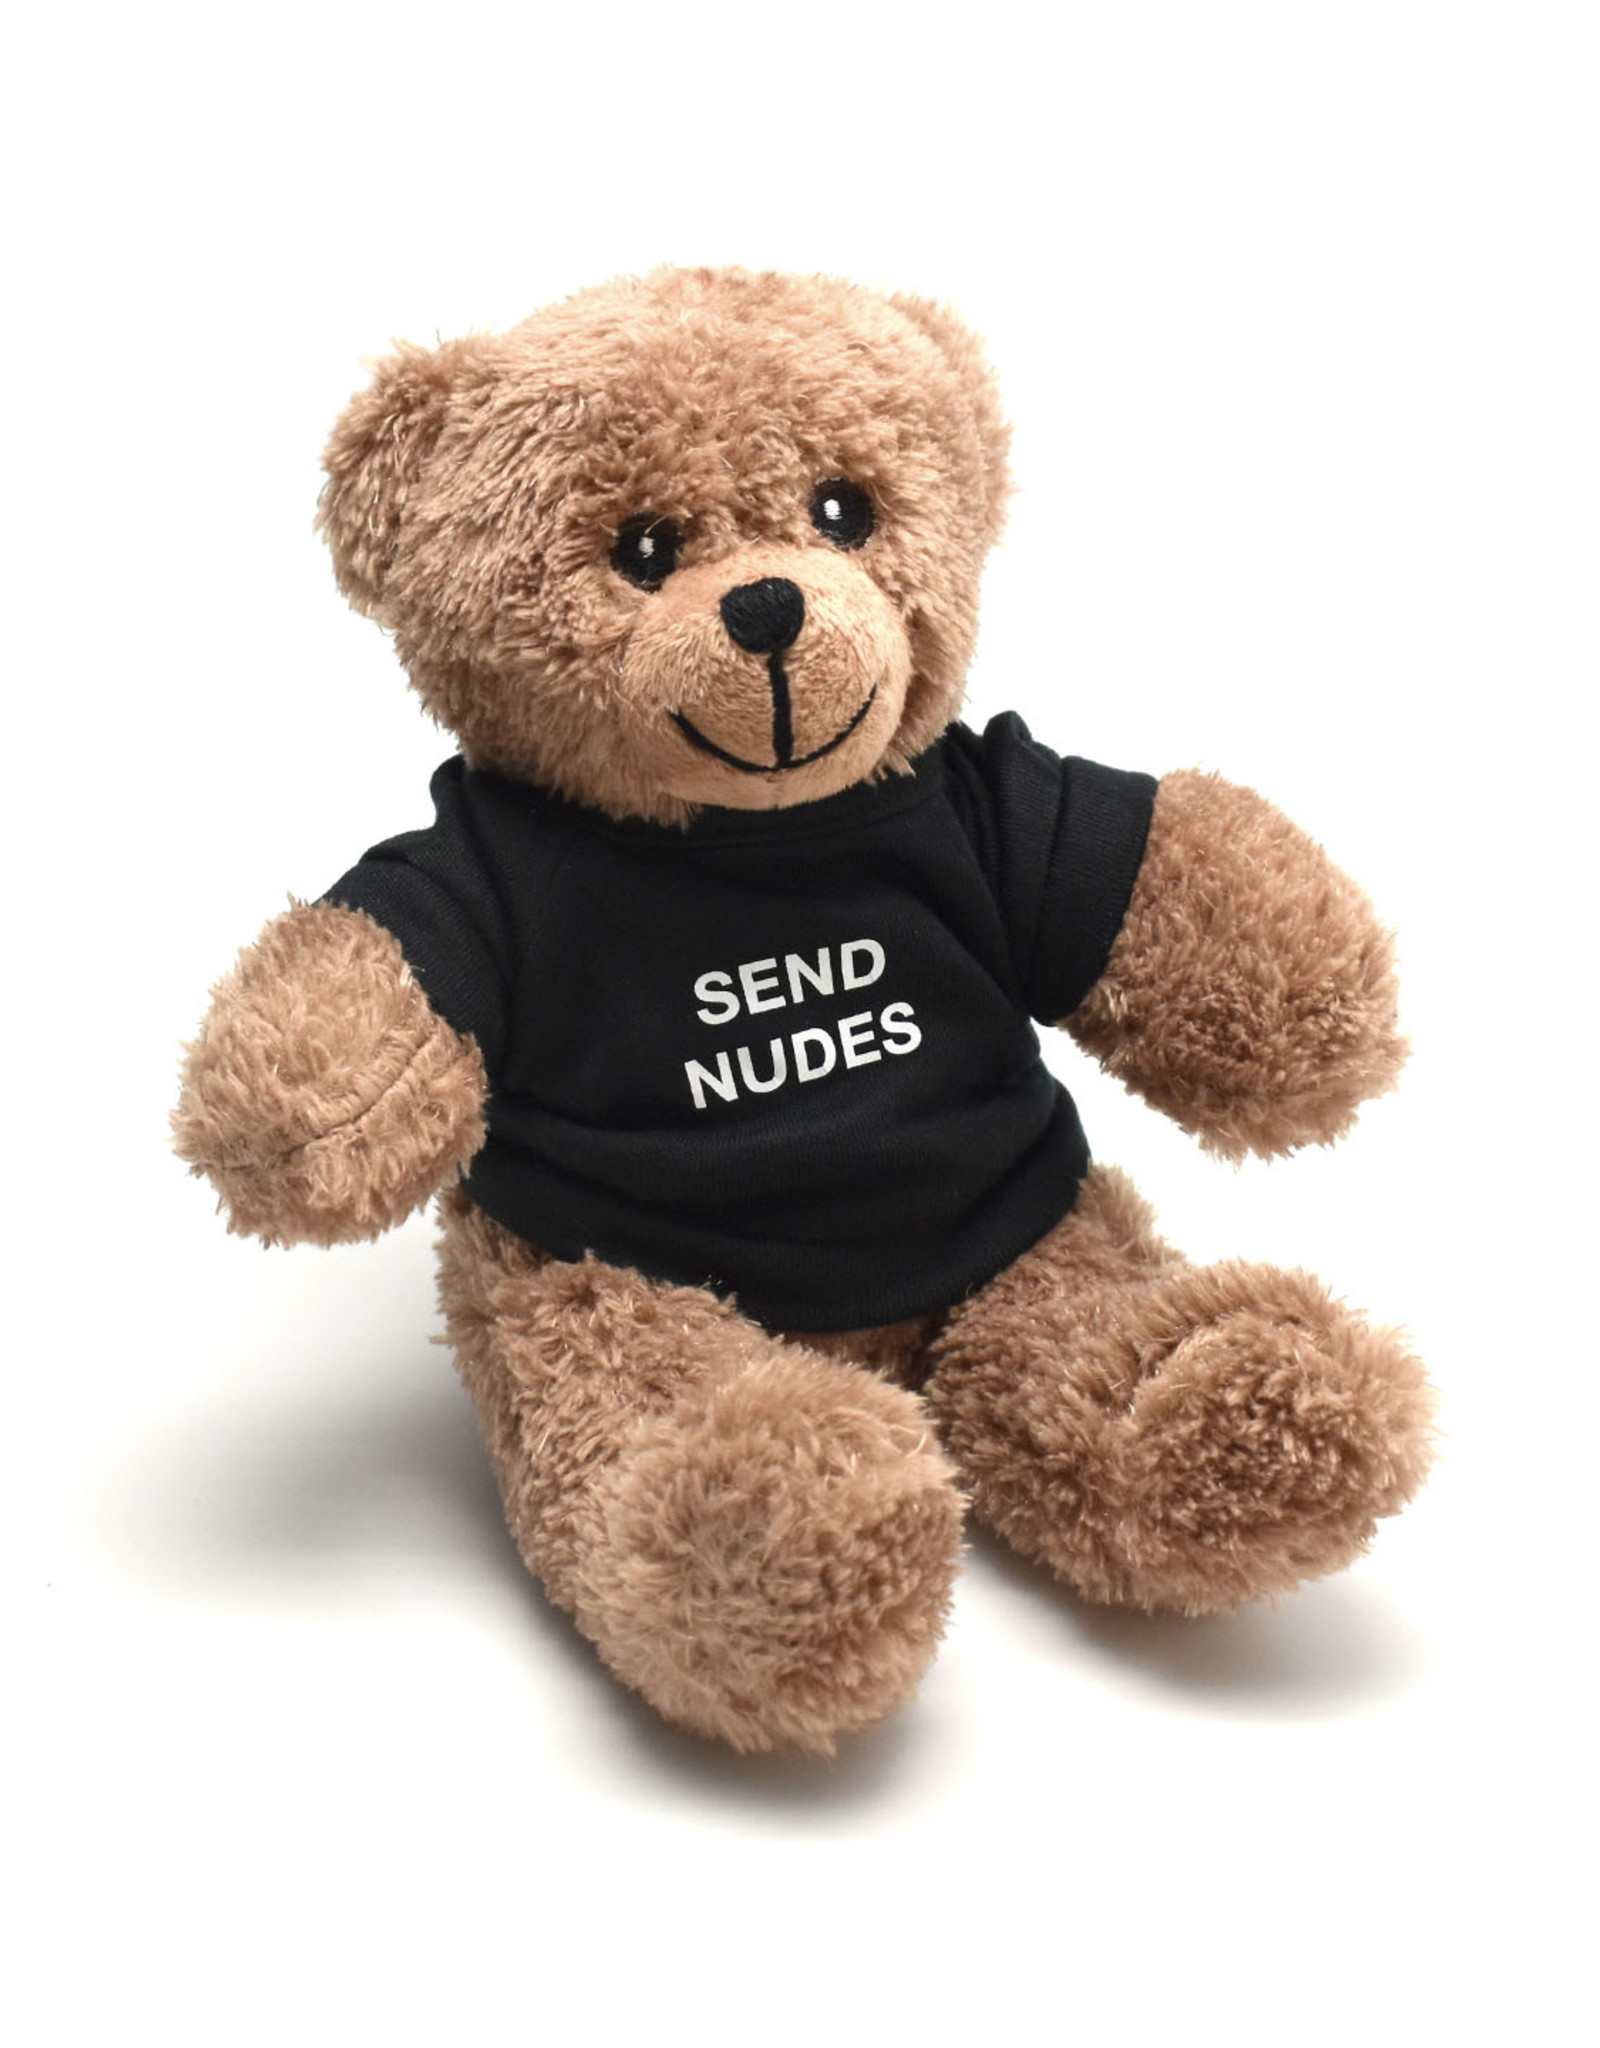 Send Nudes Teddy Bear